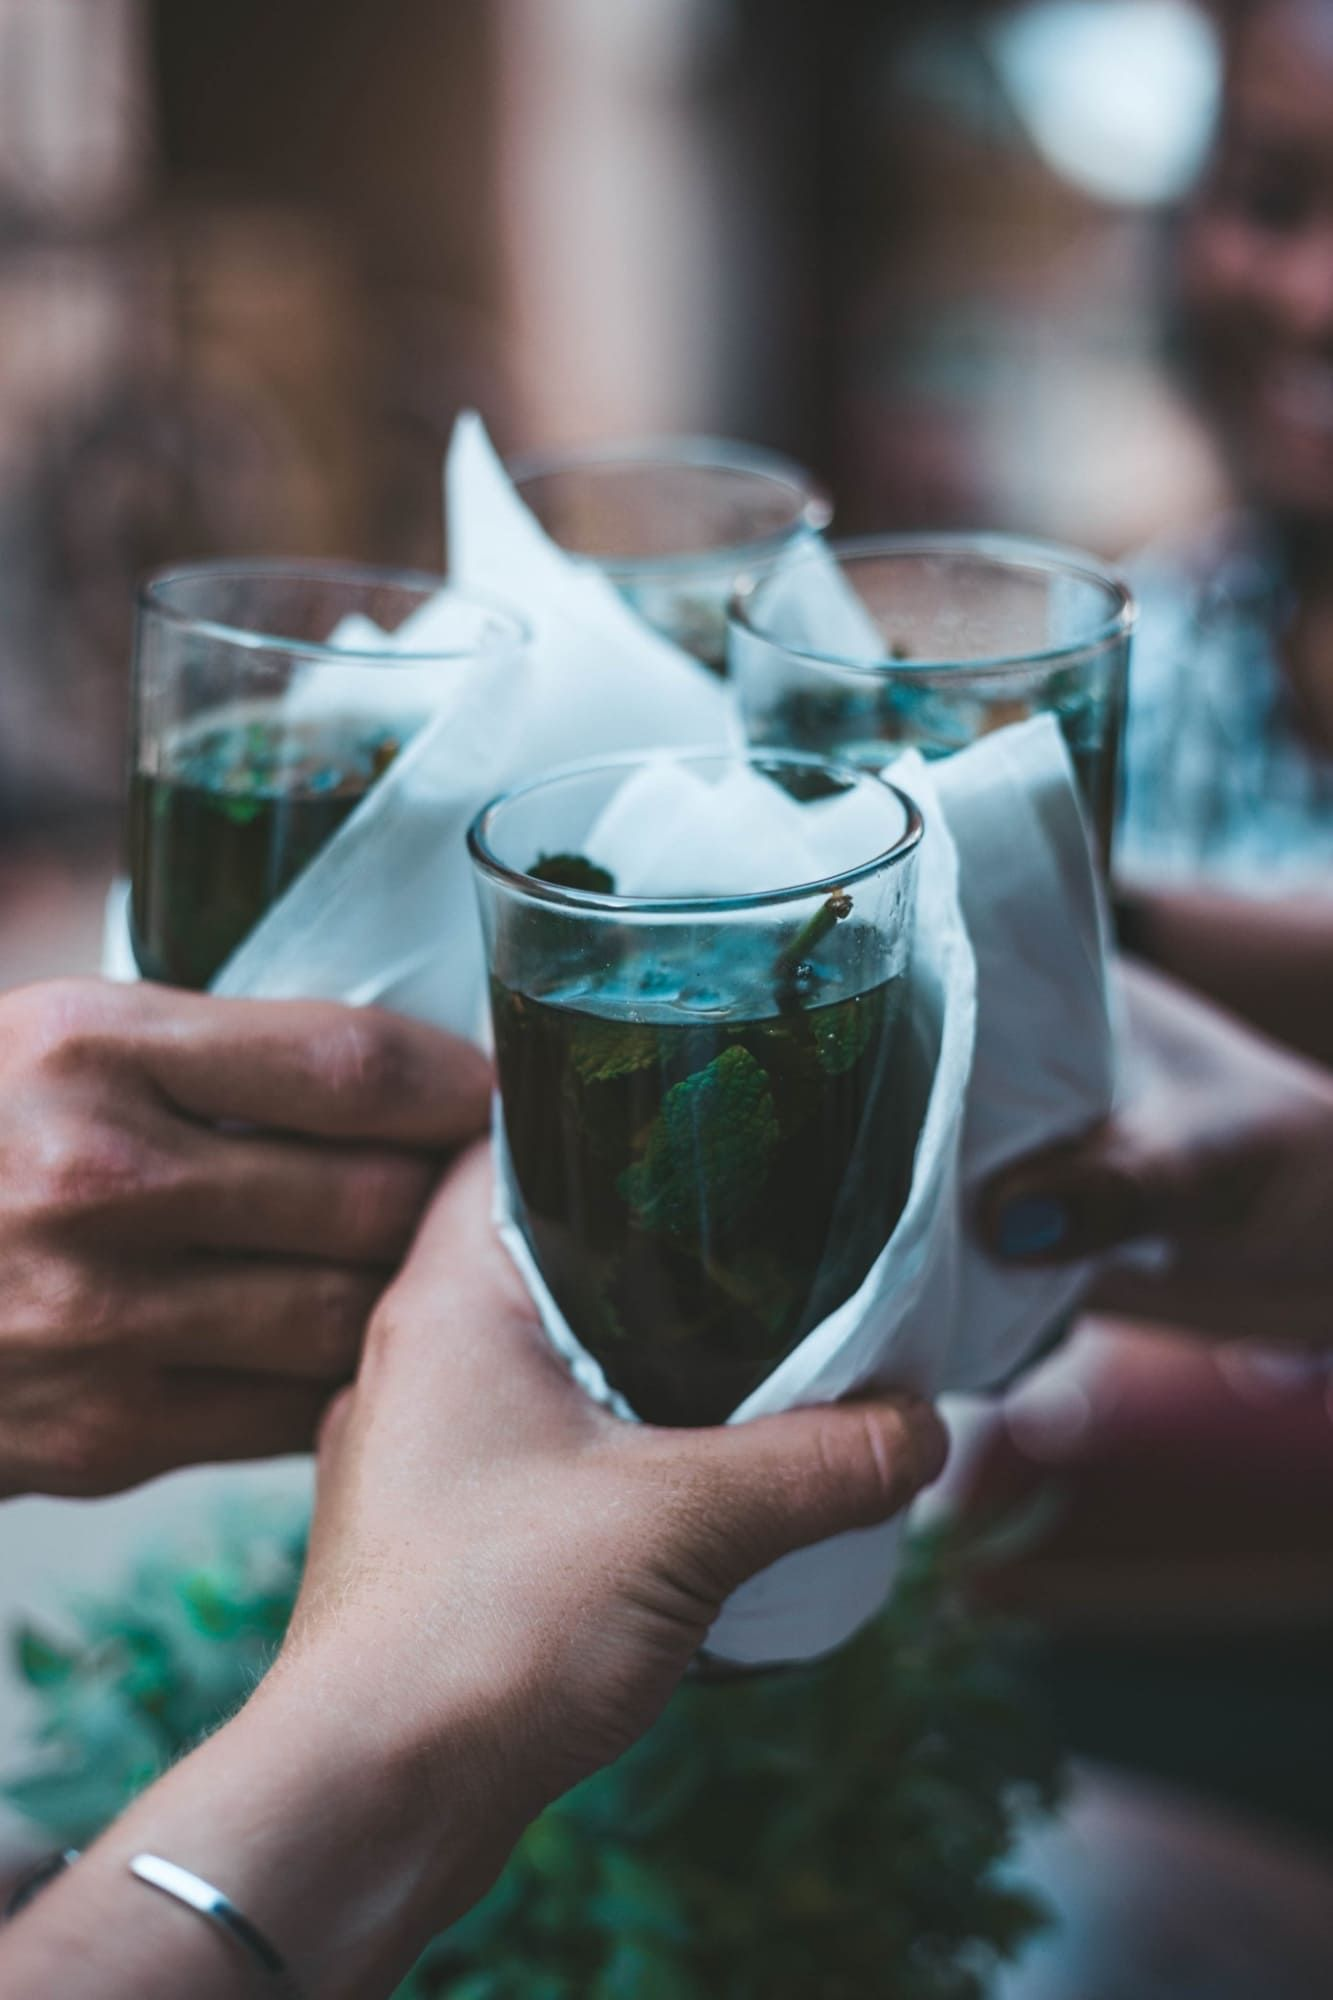 Glas ohne Strohhalm